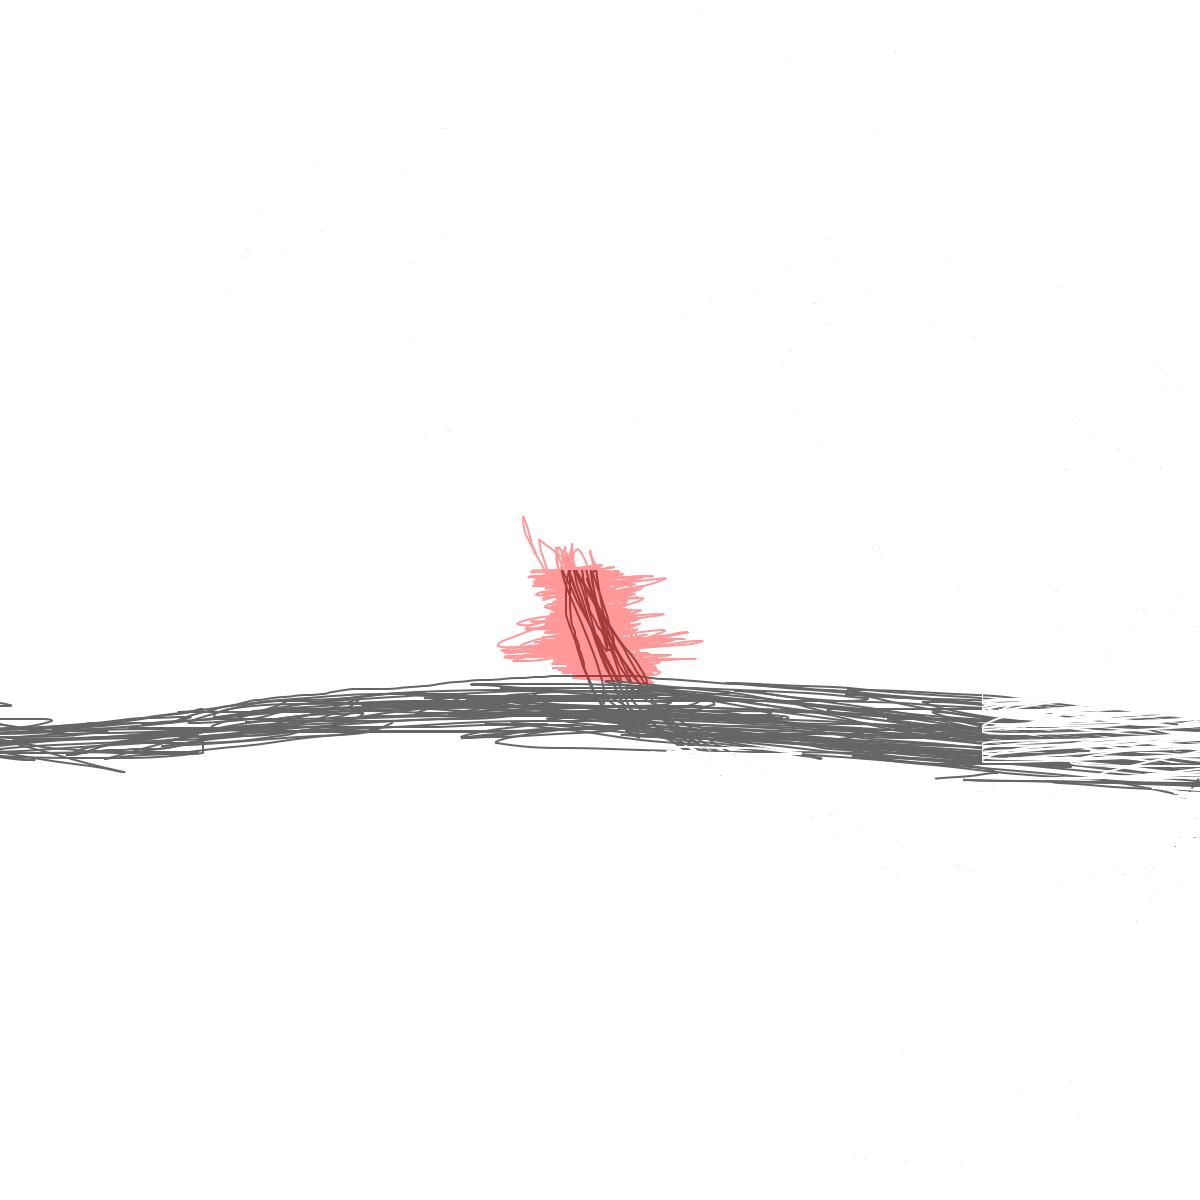 BAAAM drawing#4594 lat:44.3511428833007800lng: -4.6807937622070310